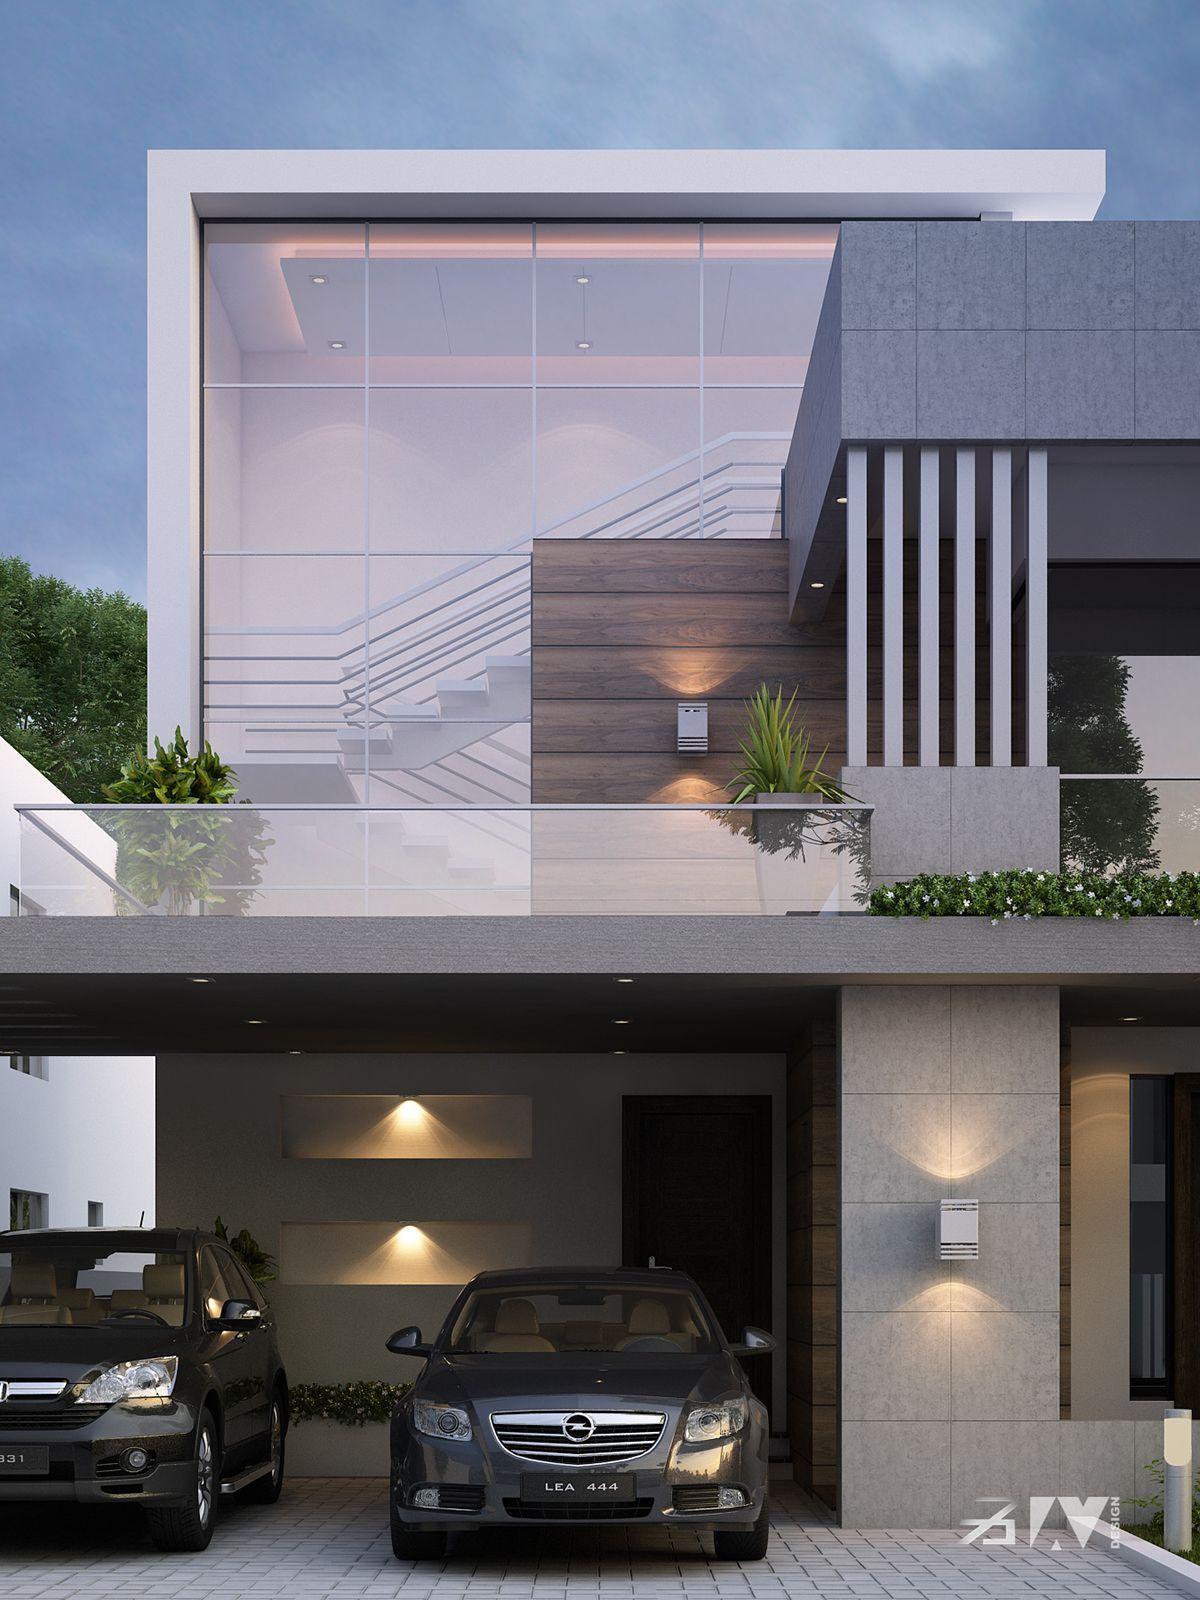 HBFC HOUSE on Behance | Architecture | Pinterest | Architektur ...